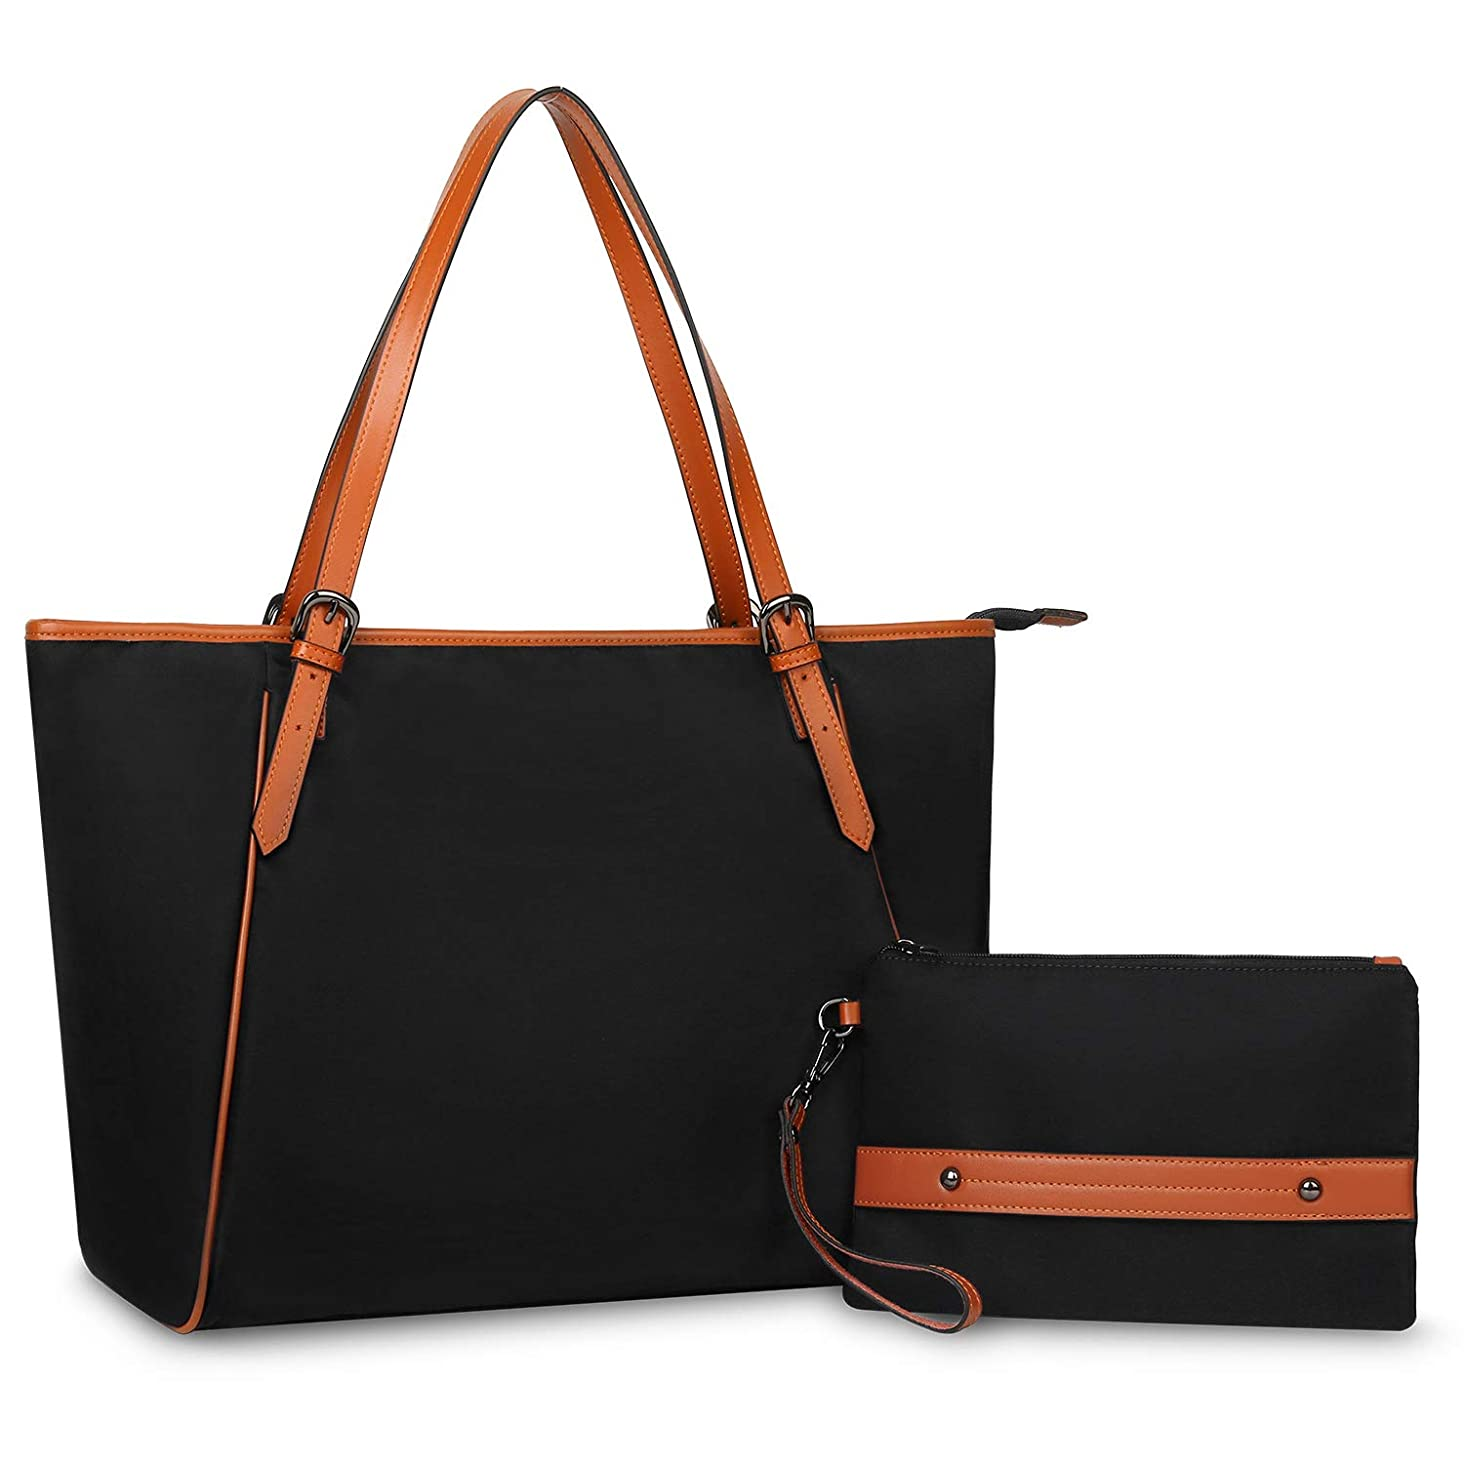 YALUXE Nylon Tote Purse Women's Shoulder Bag Oxford Large Capacity Work Fit 17'' Laptop black